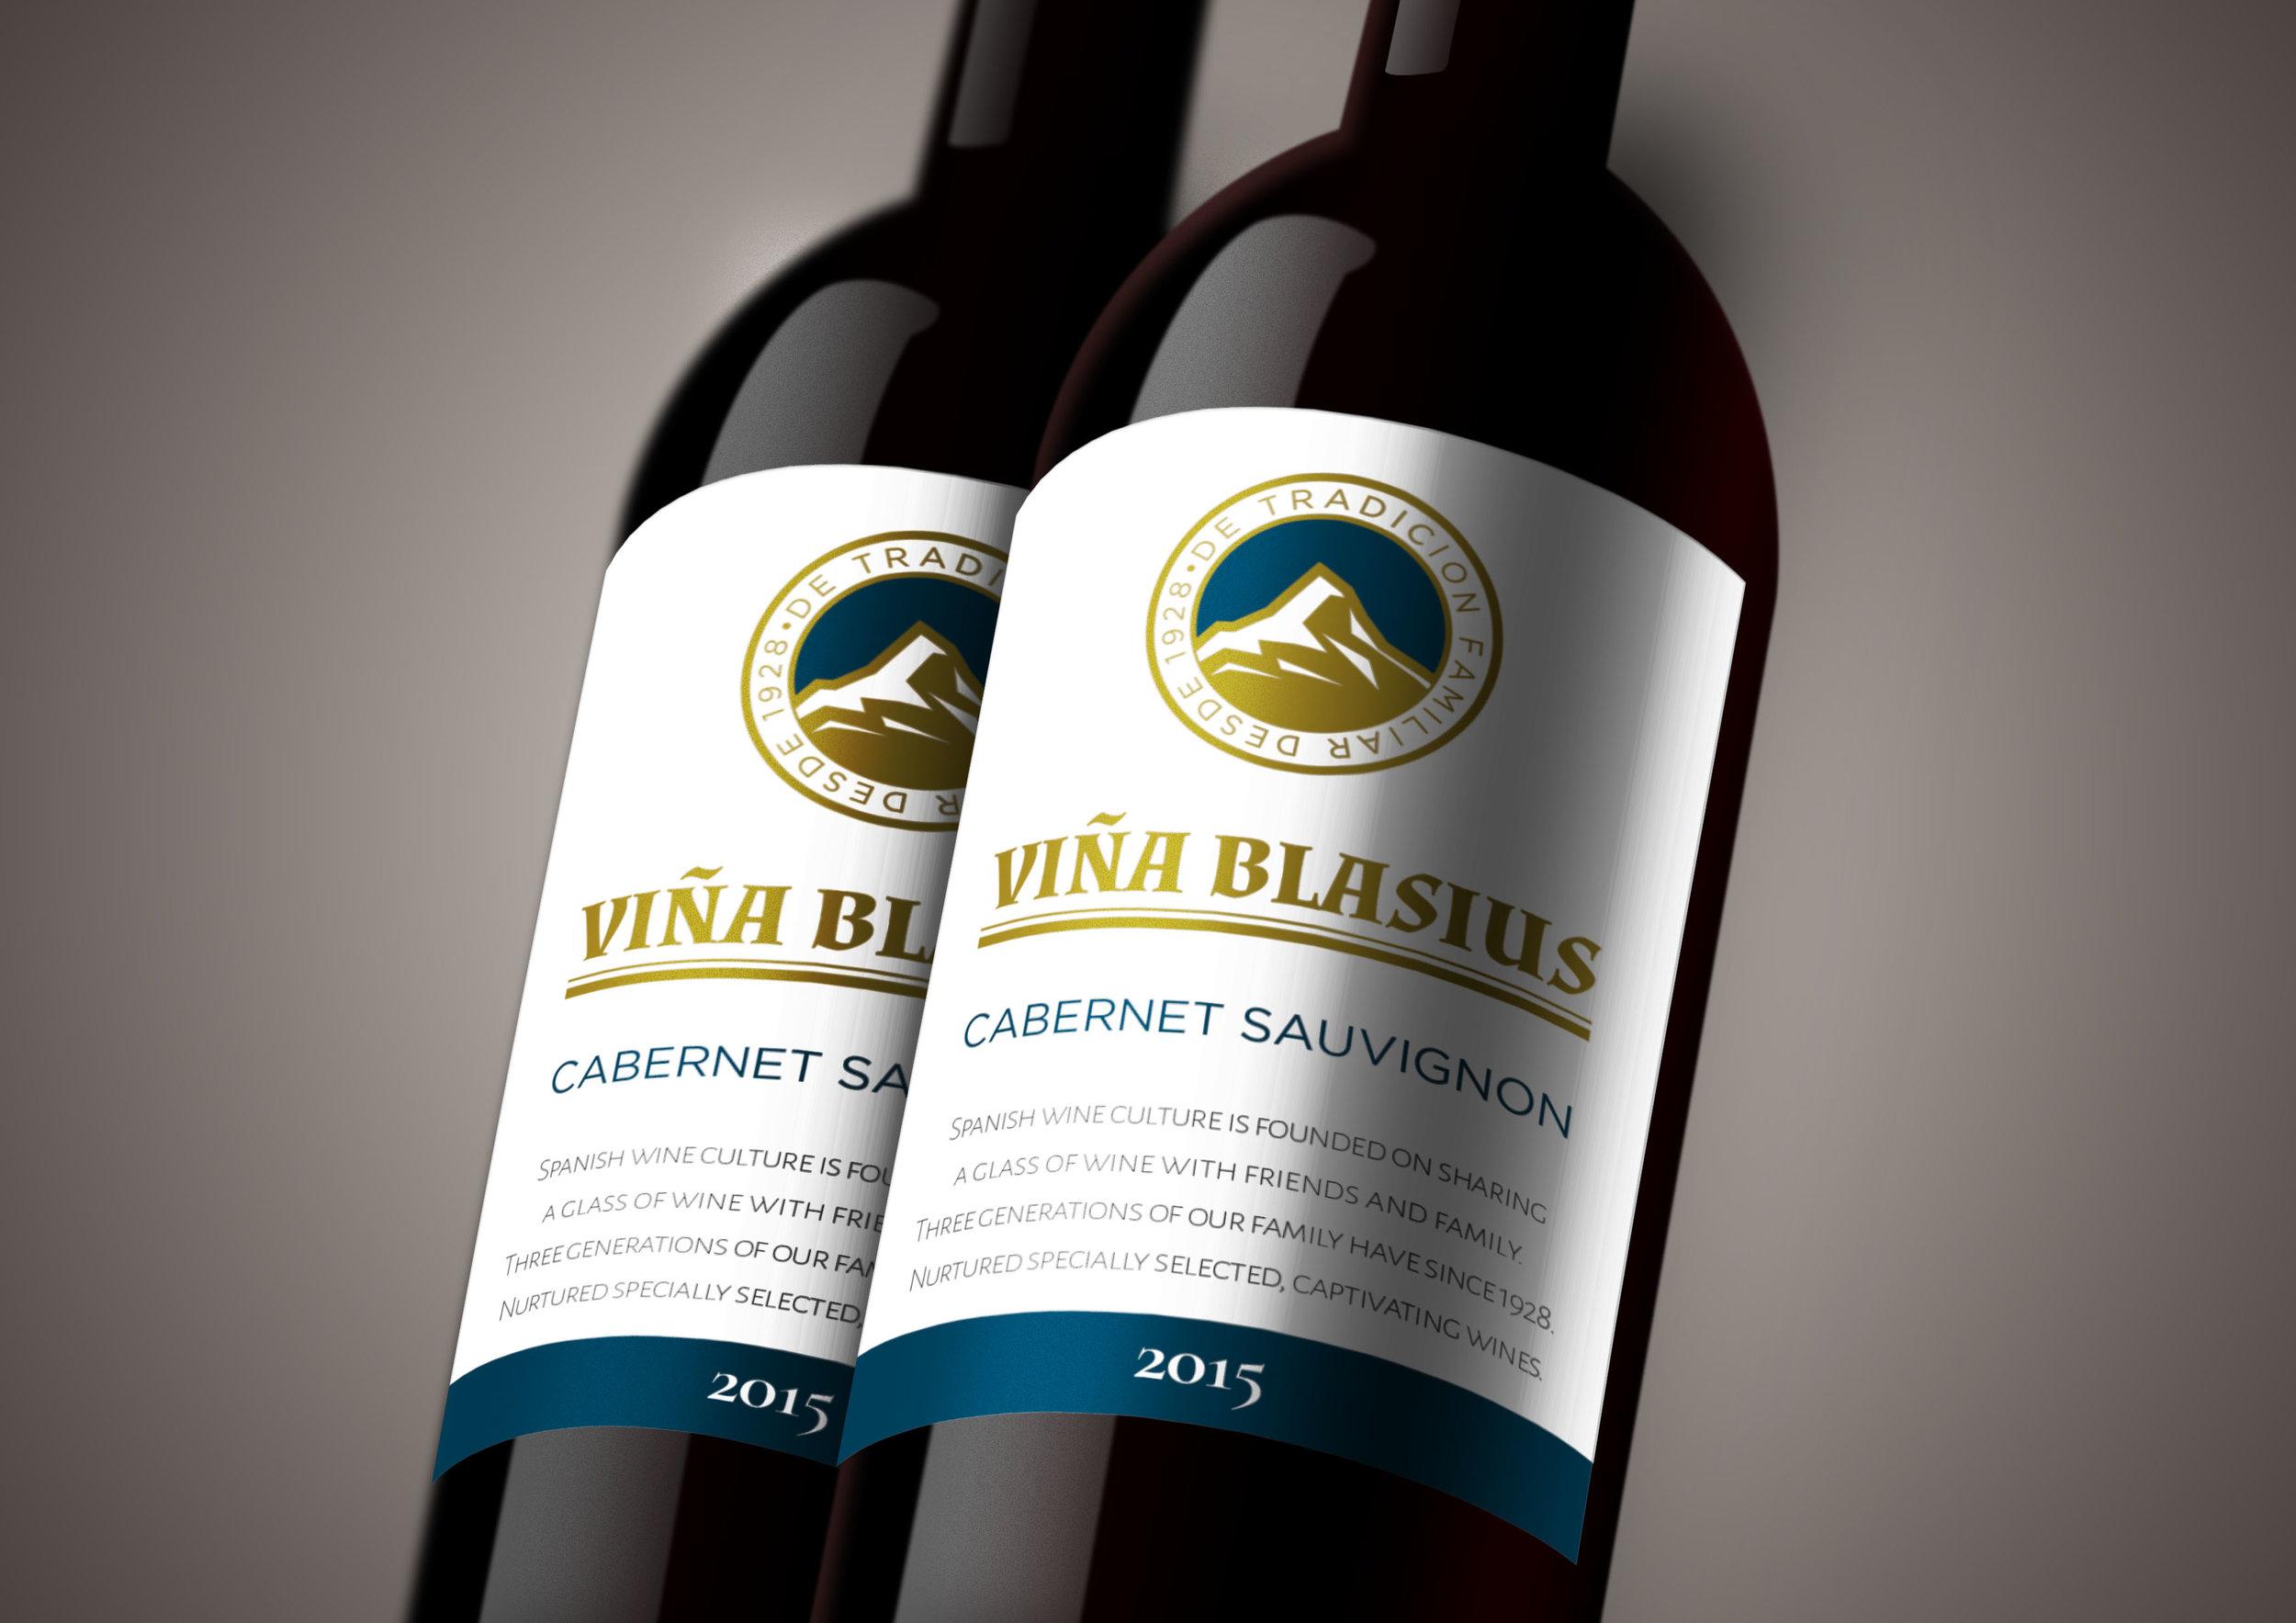 Vina Blasius 2 Bottle Shot Mock Up.jpg